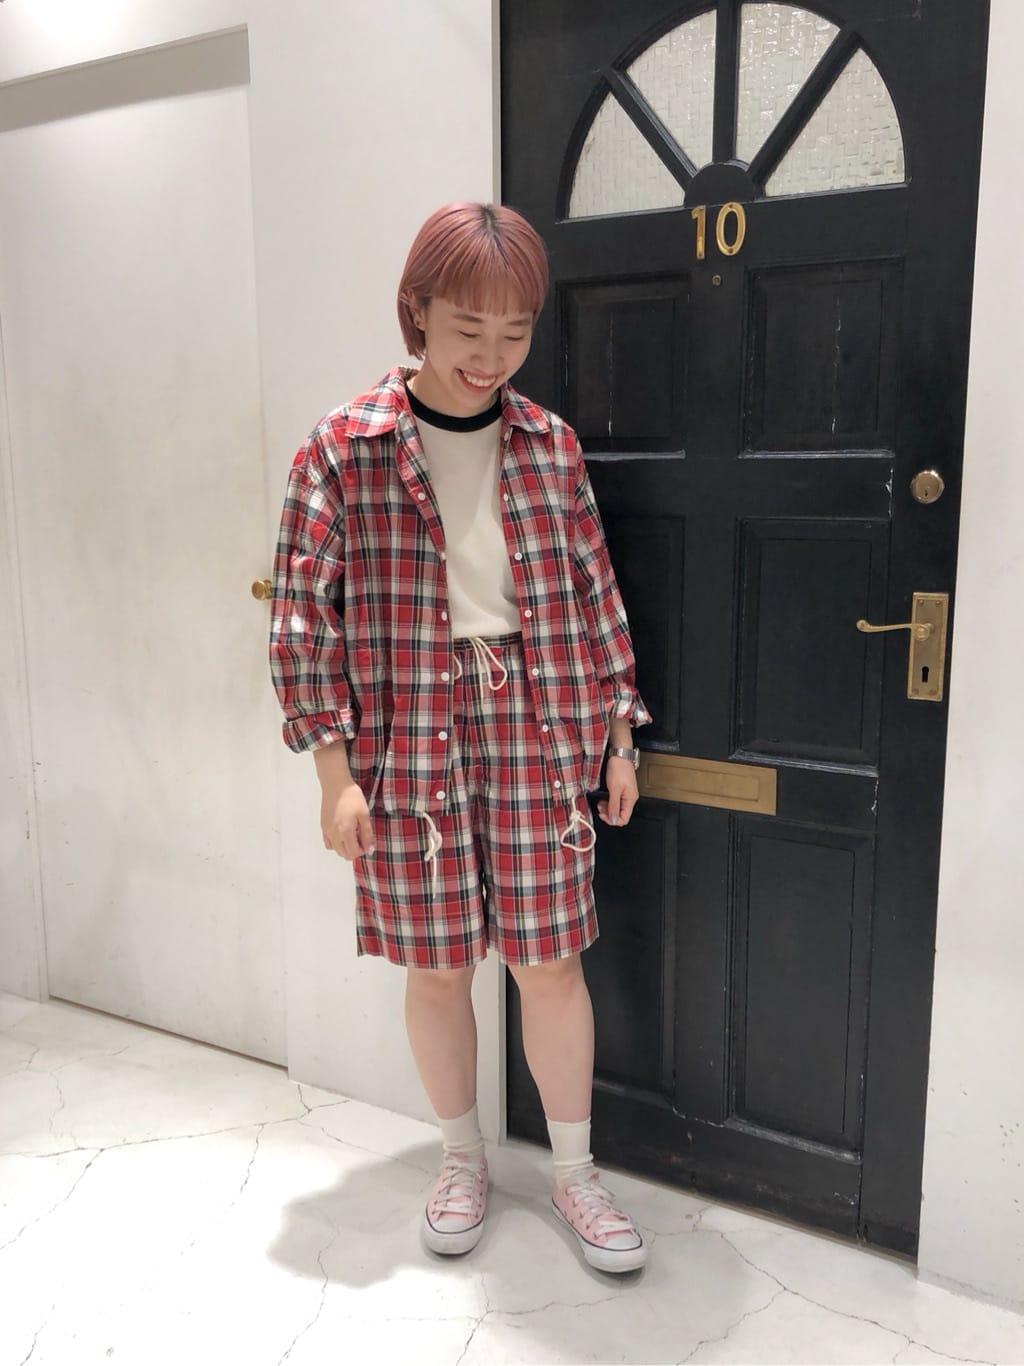 Dot and Stripes CHILD WOMAN ルクアイーレ 身長:157cm 2021.08.17